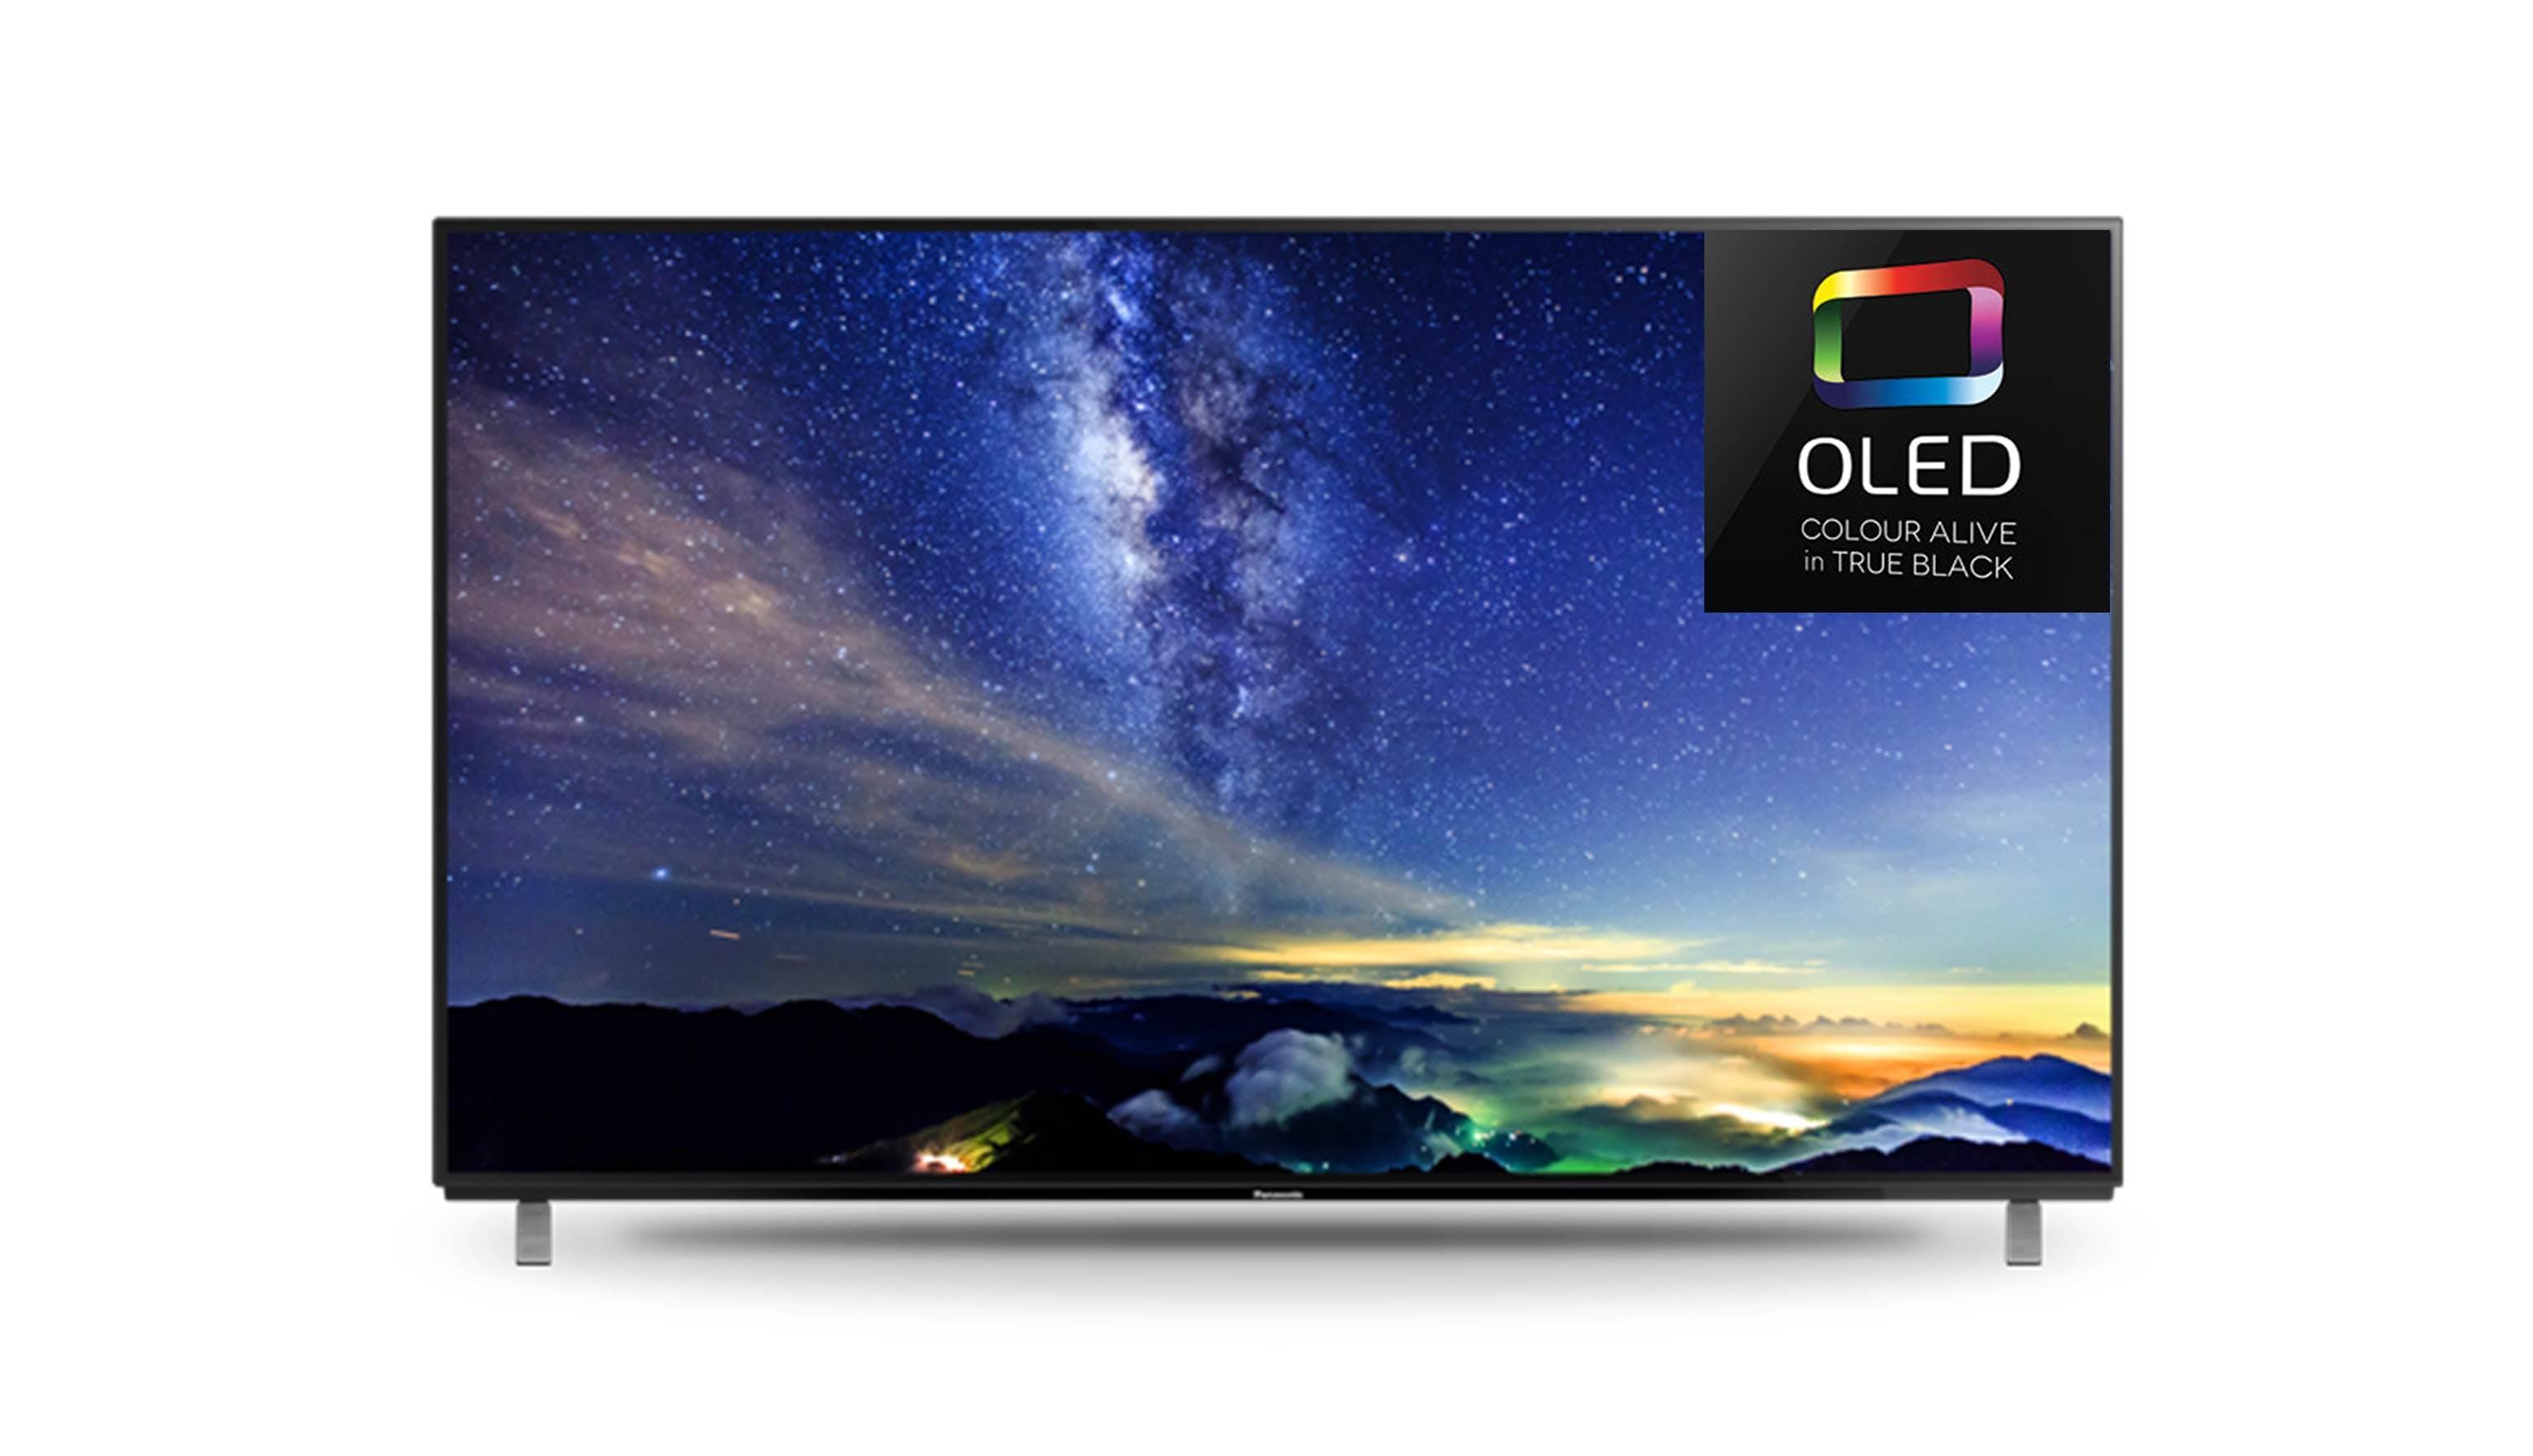 panasonic th 55ez950s 4k 55 oled smart tv harvey norman singapore. Black Bedroom Furniture Sets. Home Design Ideas